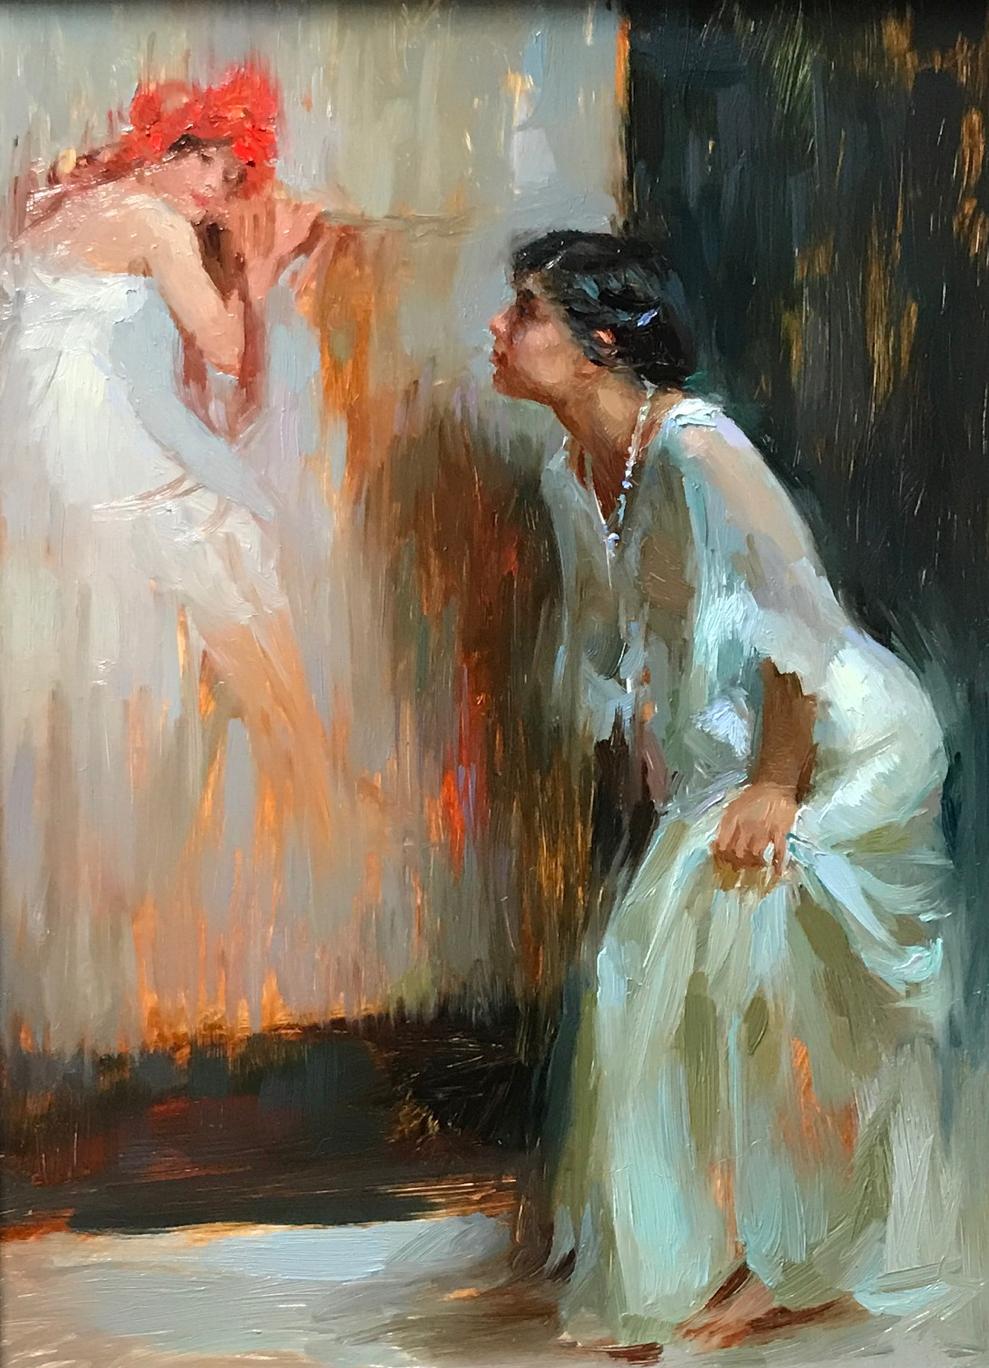 Suchitra Bhosle